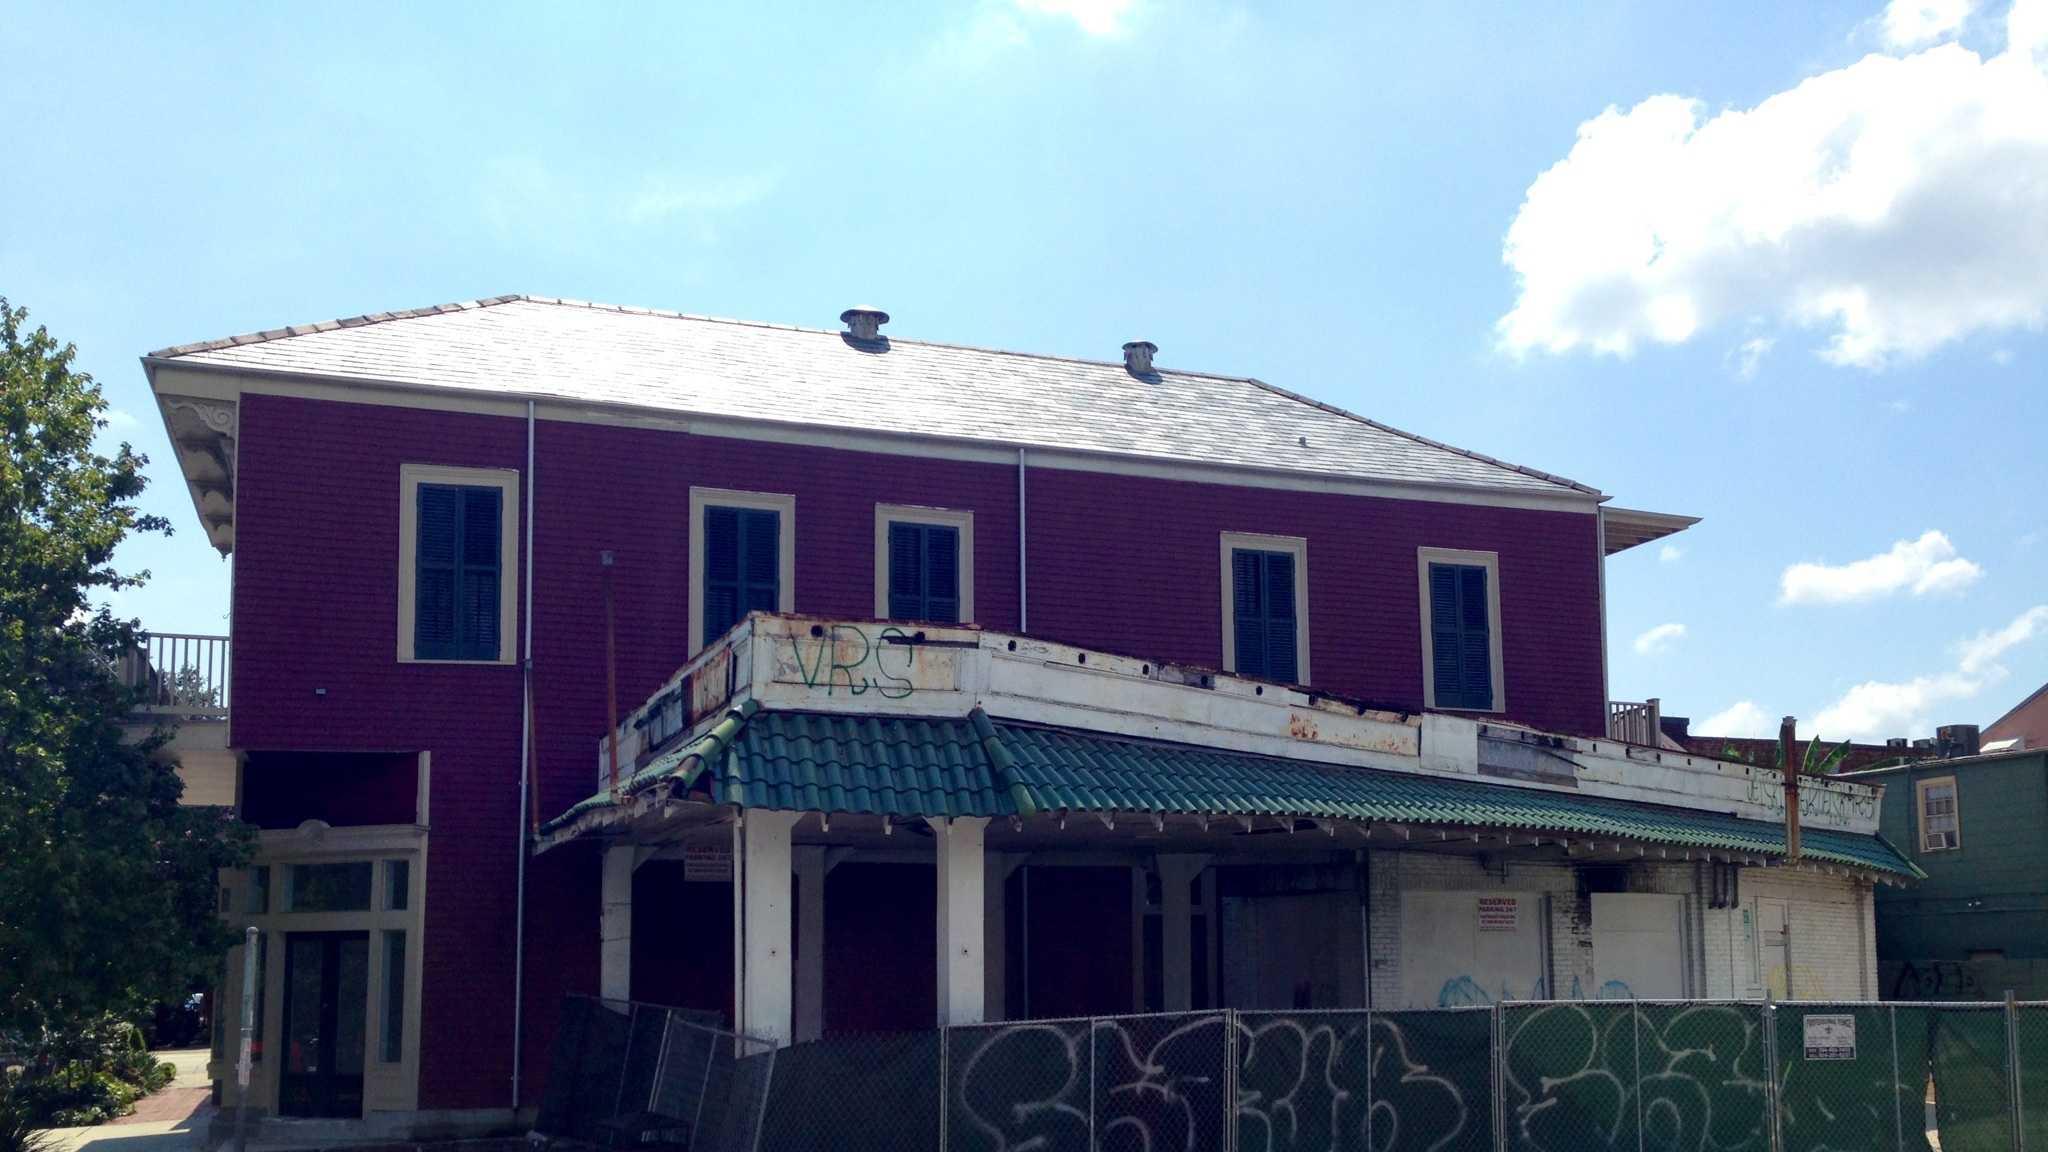 Future Habana Outpost